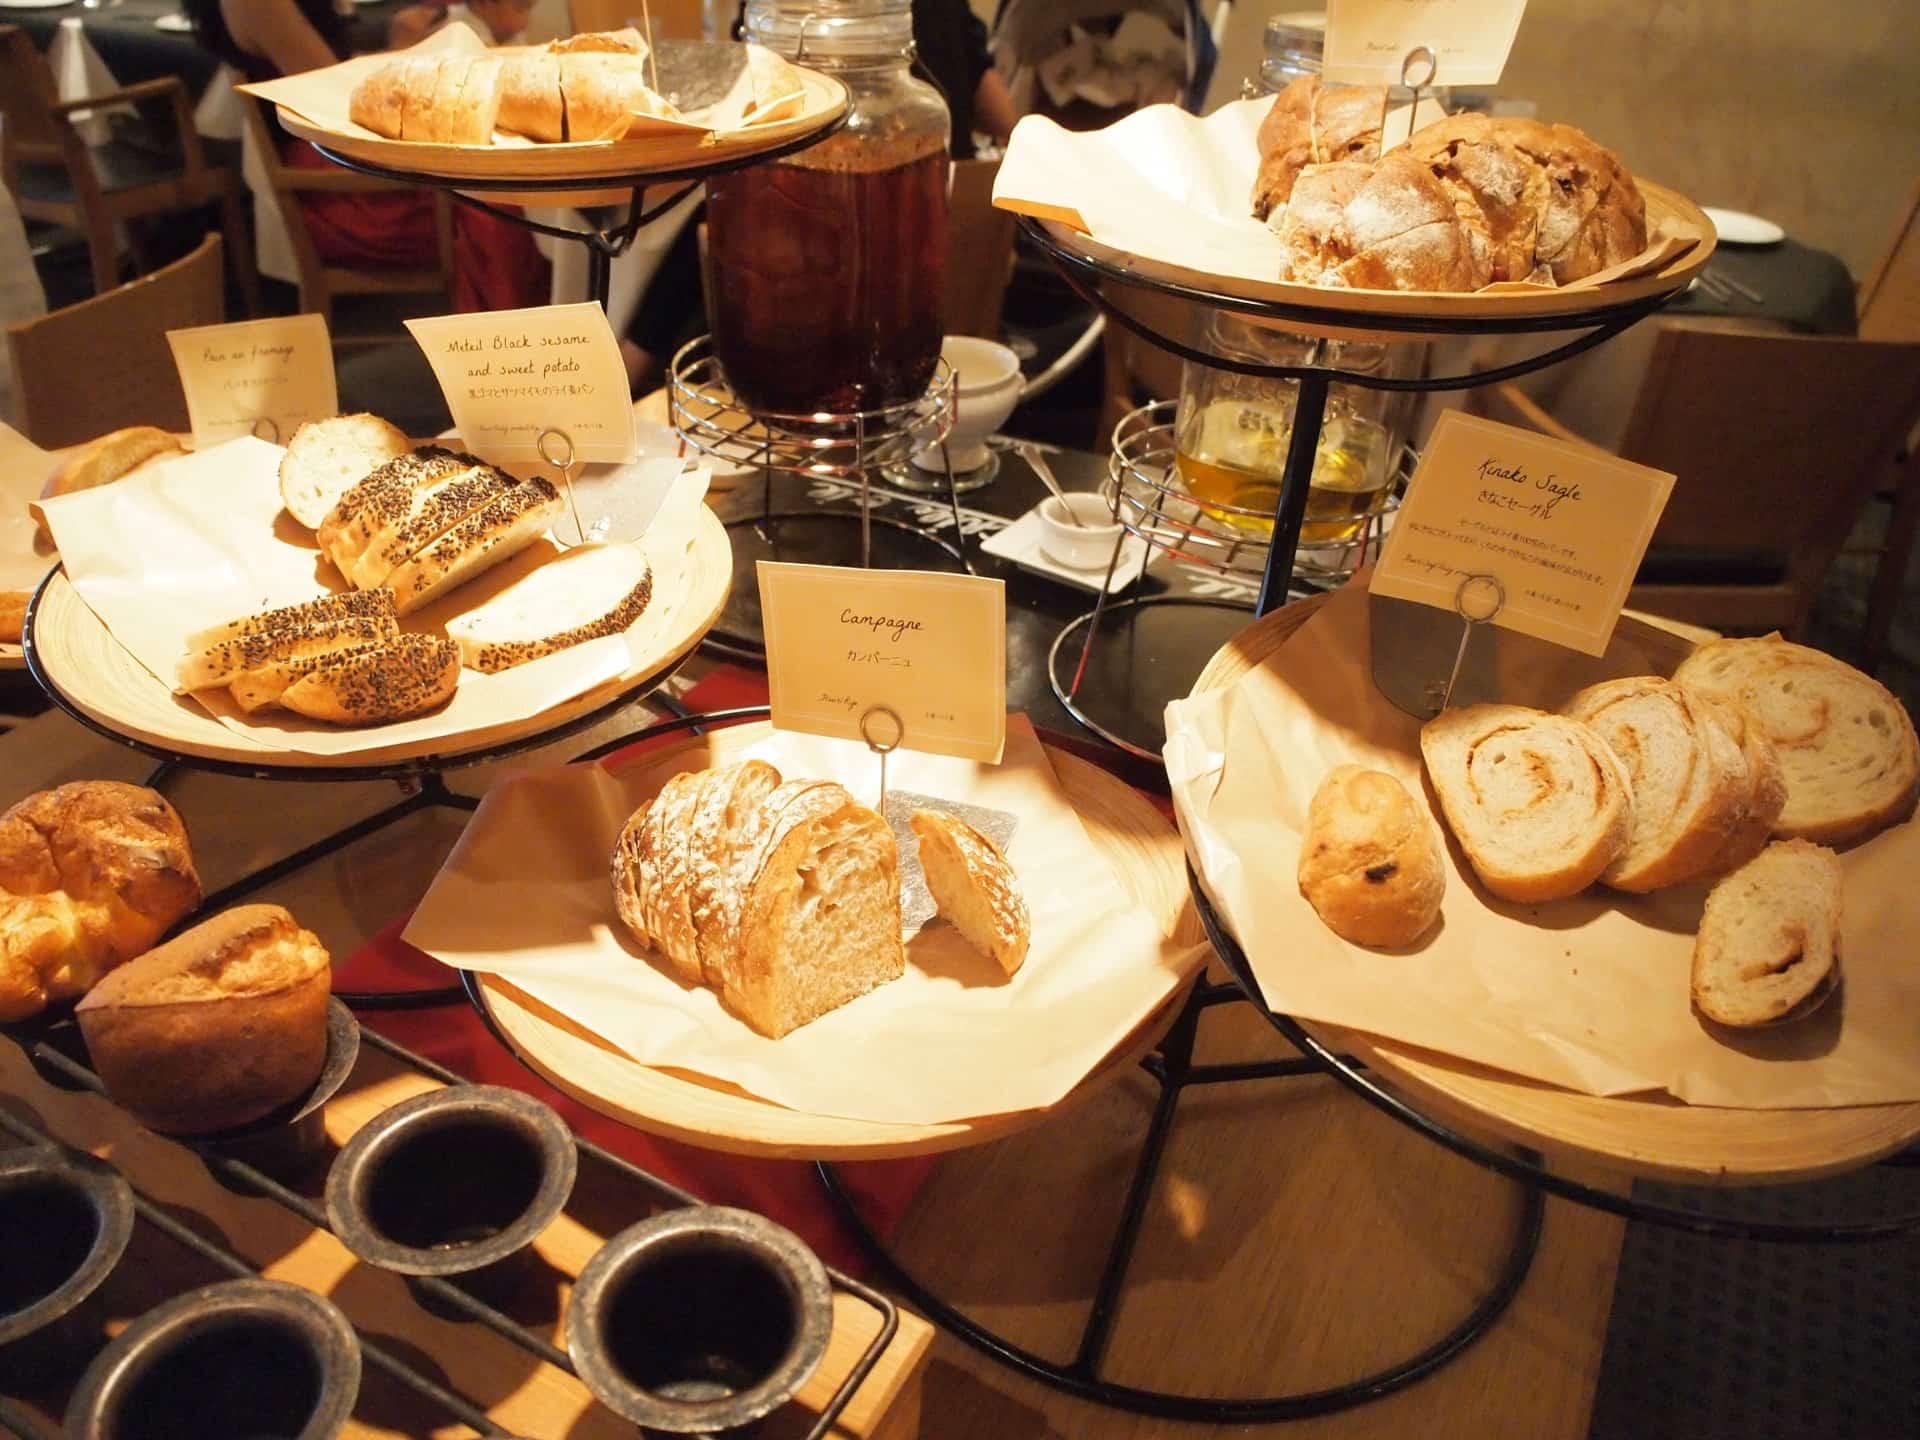 CENTRAL セントラル 神戸 三宮 元町 パン食べ放題 ランチ